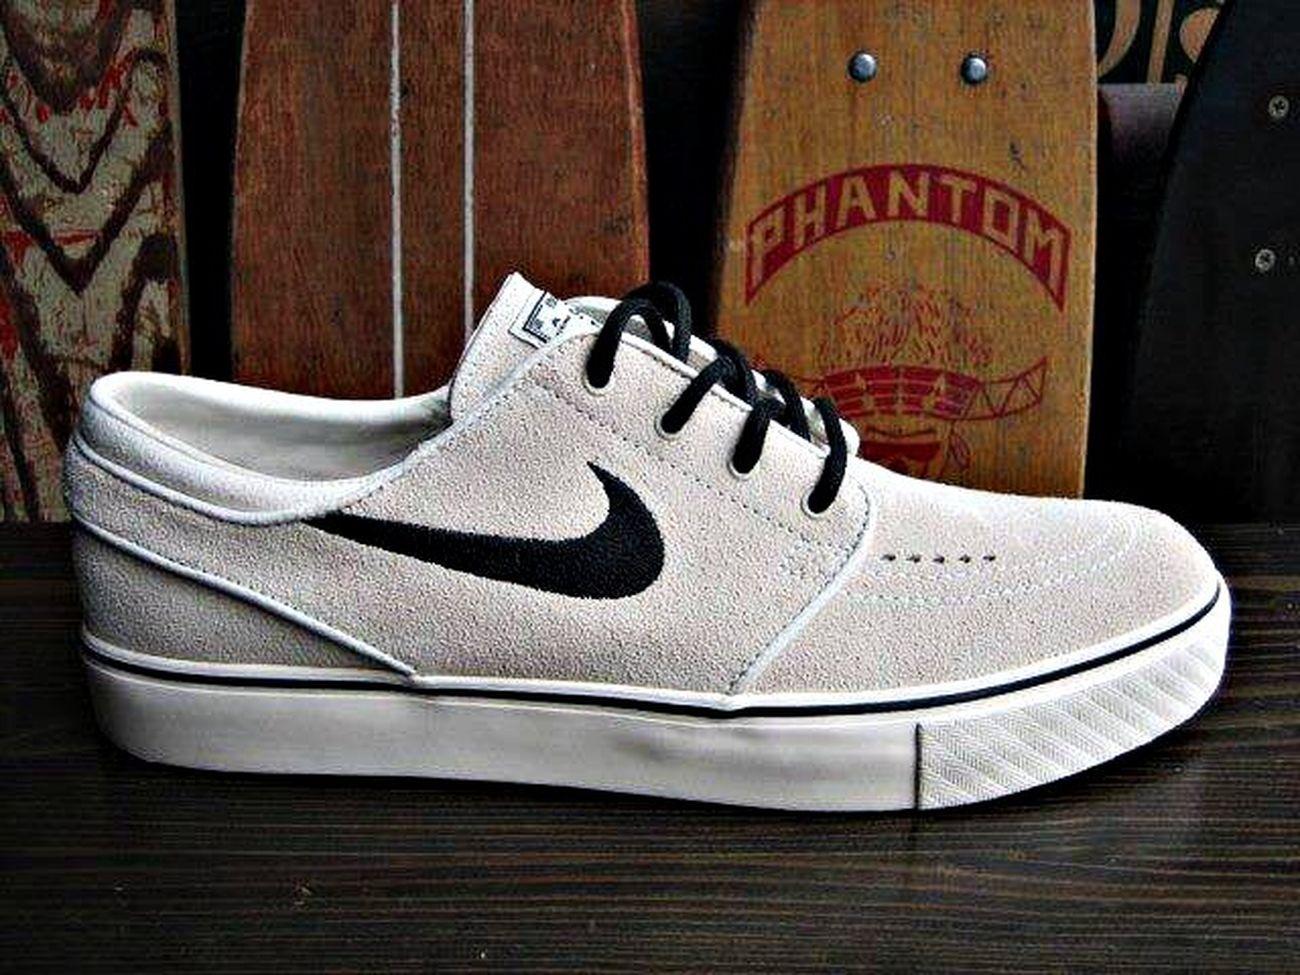 New janoskis Taking Photos Nike Skateboarding Hello World